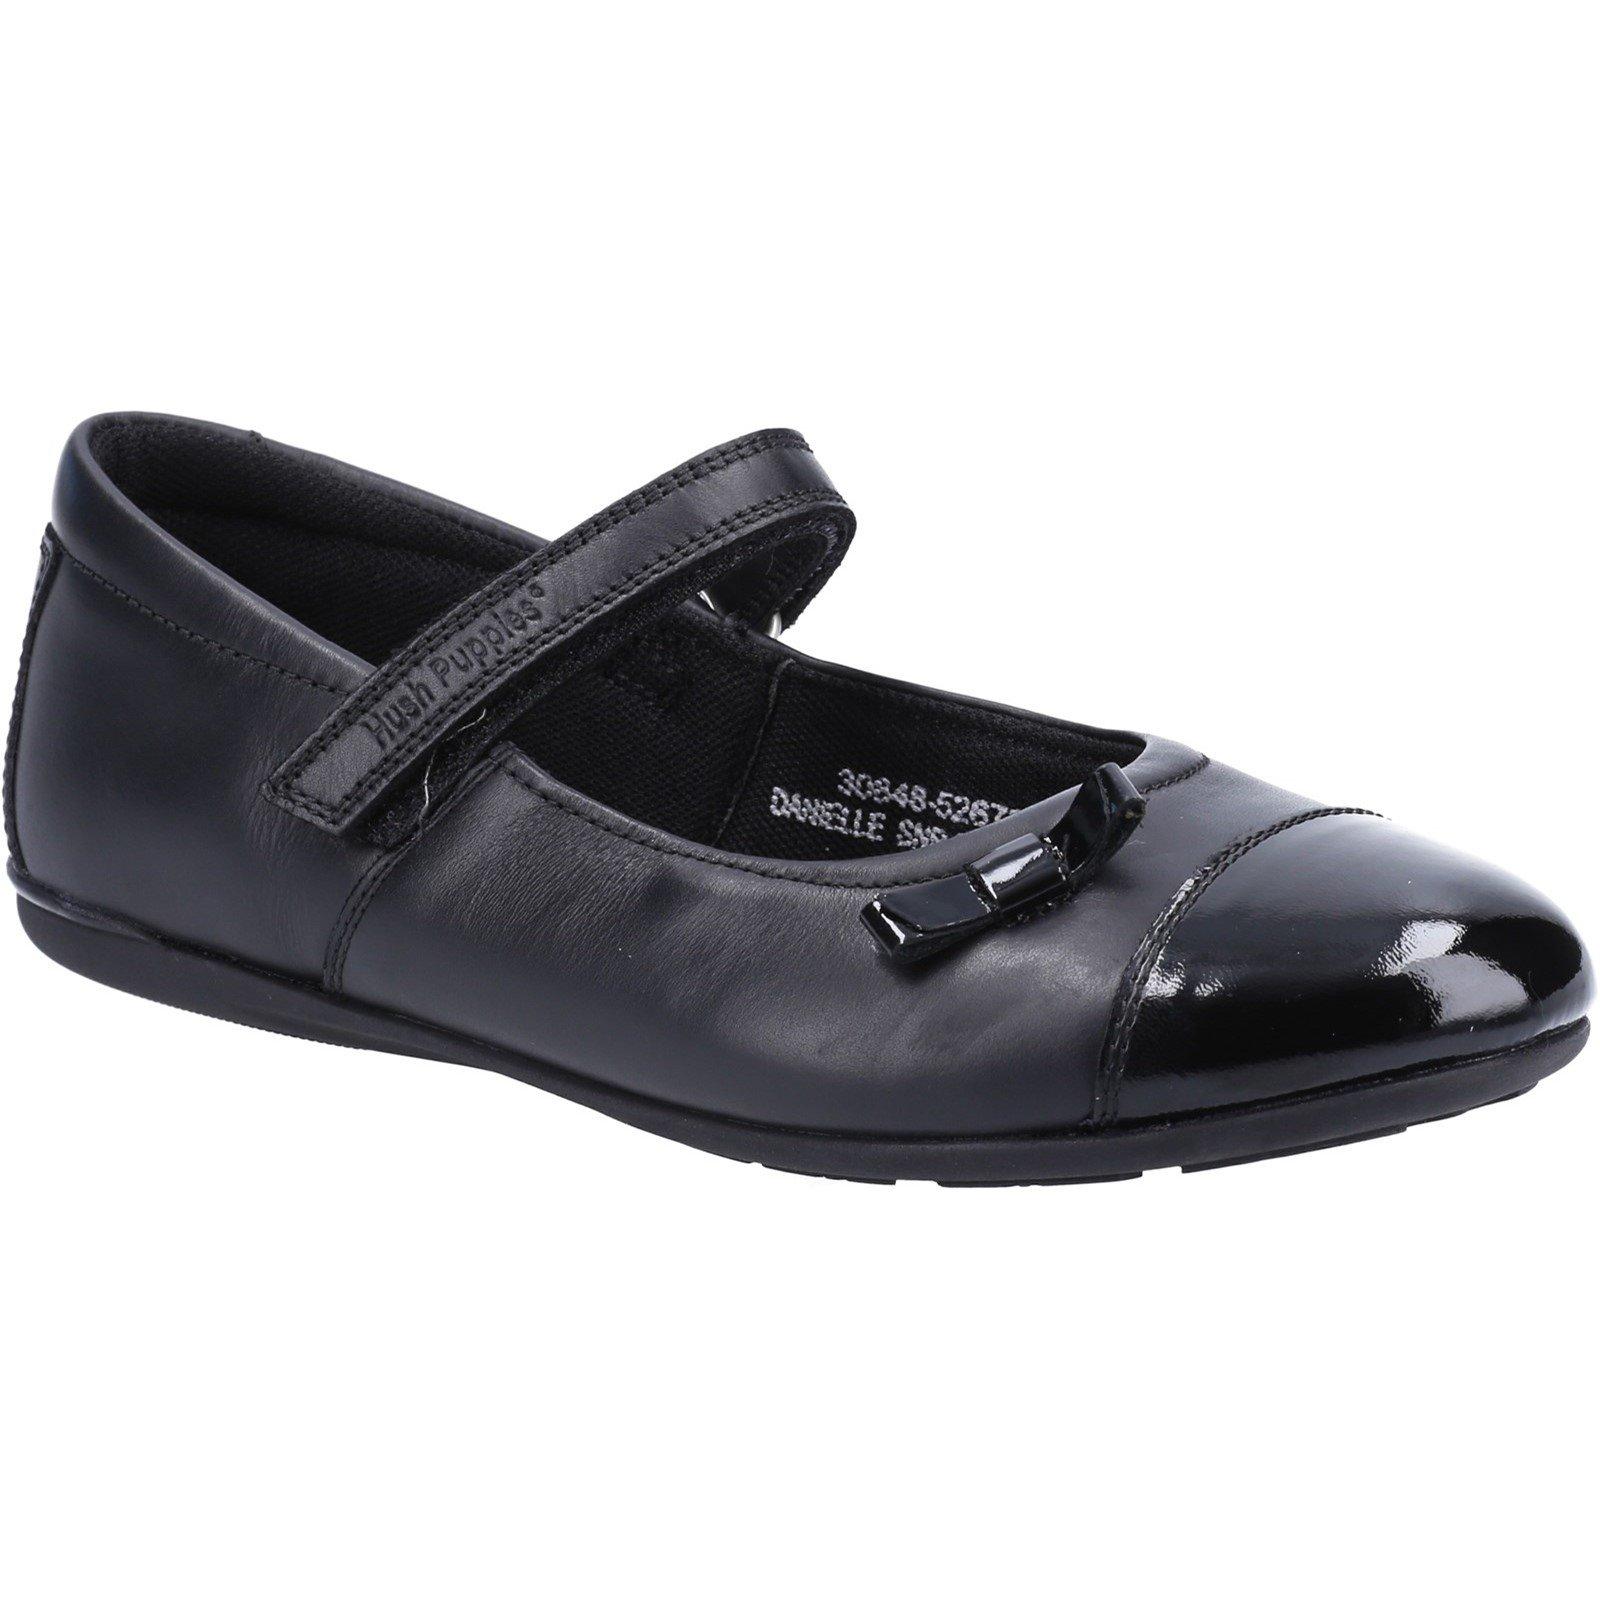 Hush Puppies Kid's Danielle Senior School Shoe Black 30848 - Black 3